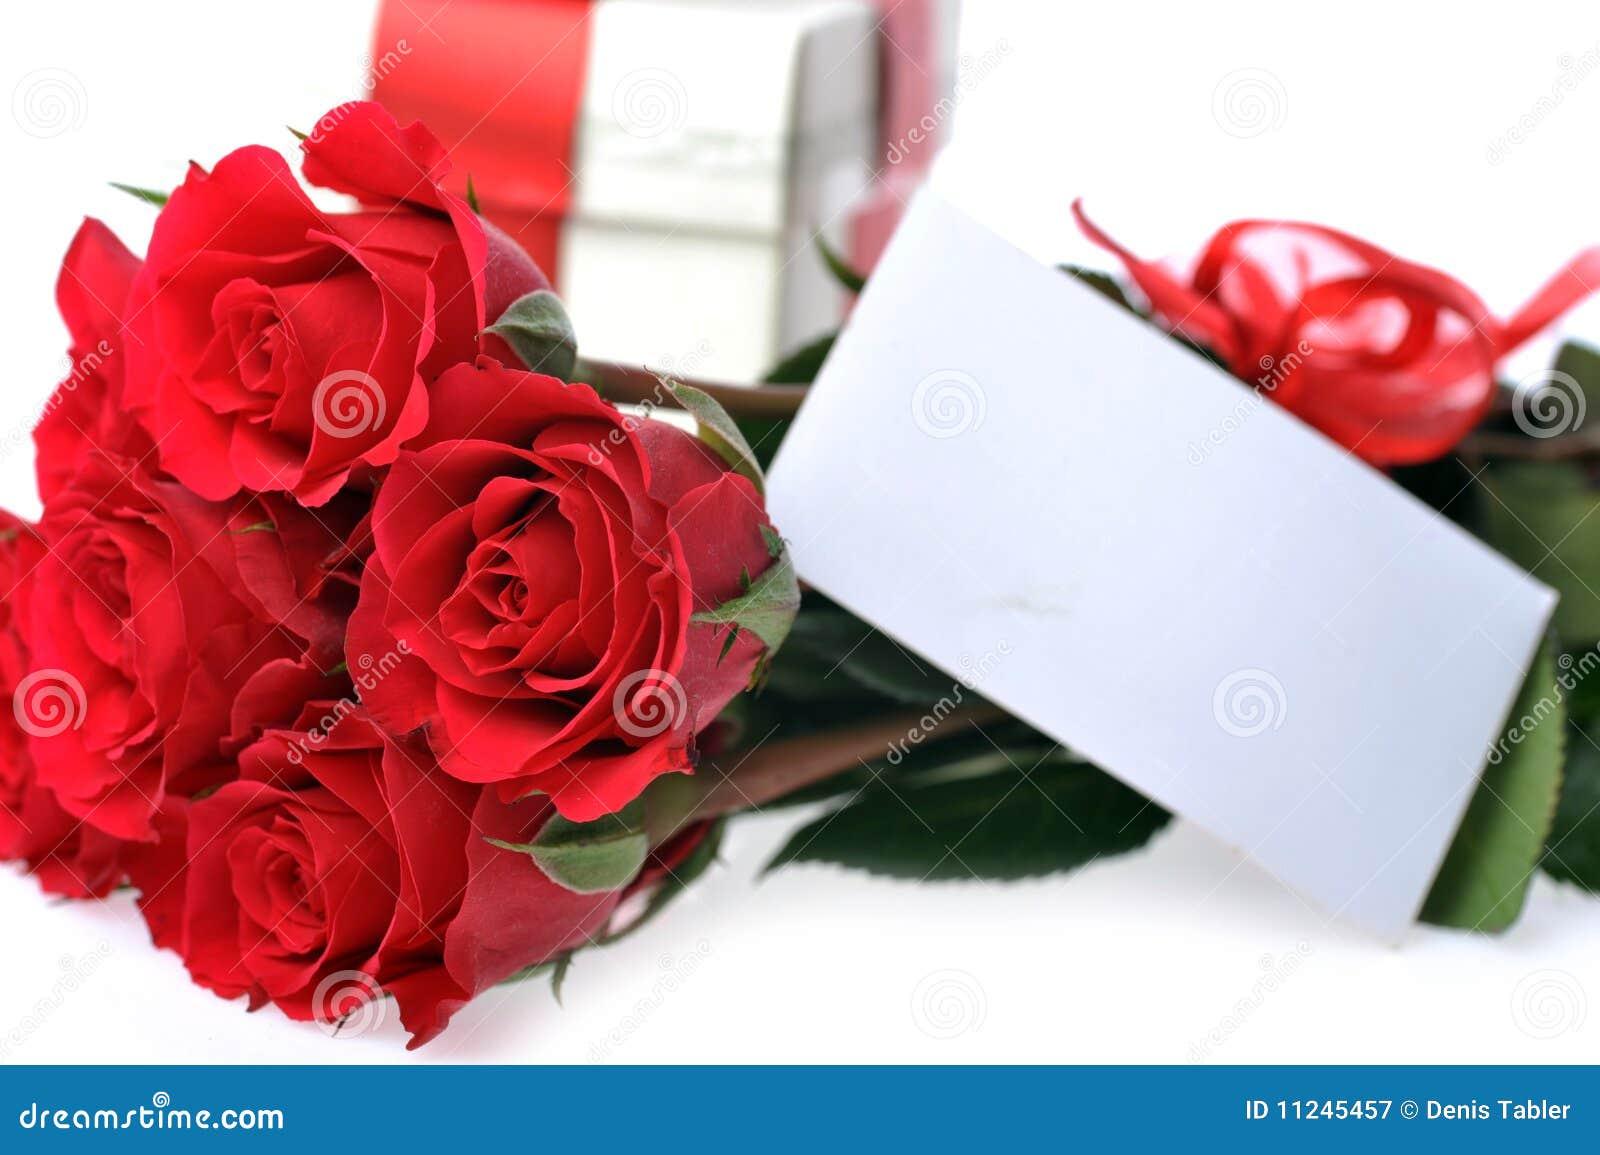 Rosas rojas hermosas con la tarjeta conocida imagen de - Rosas rosas hermosas ...